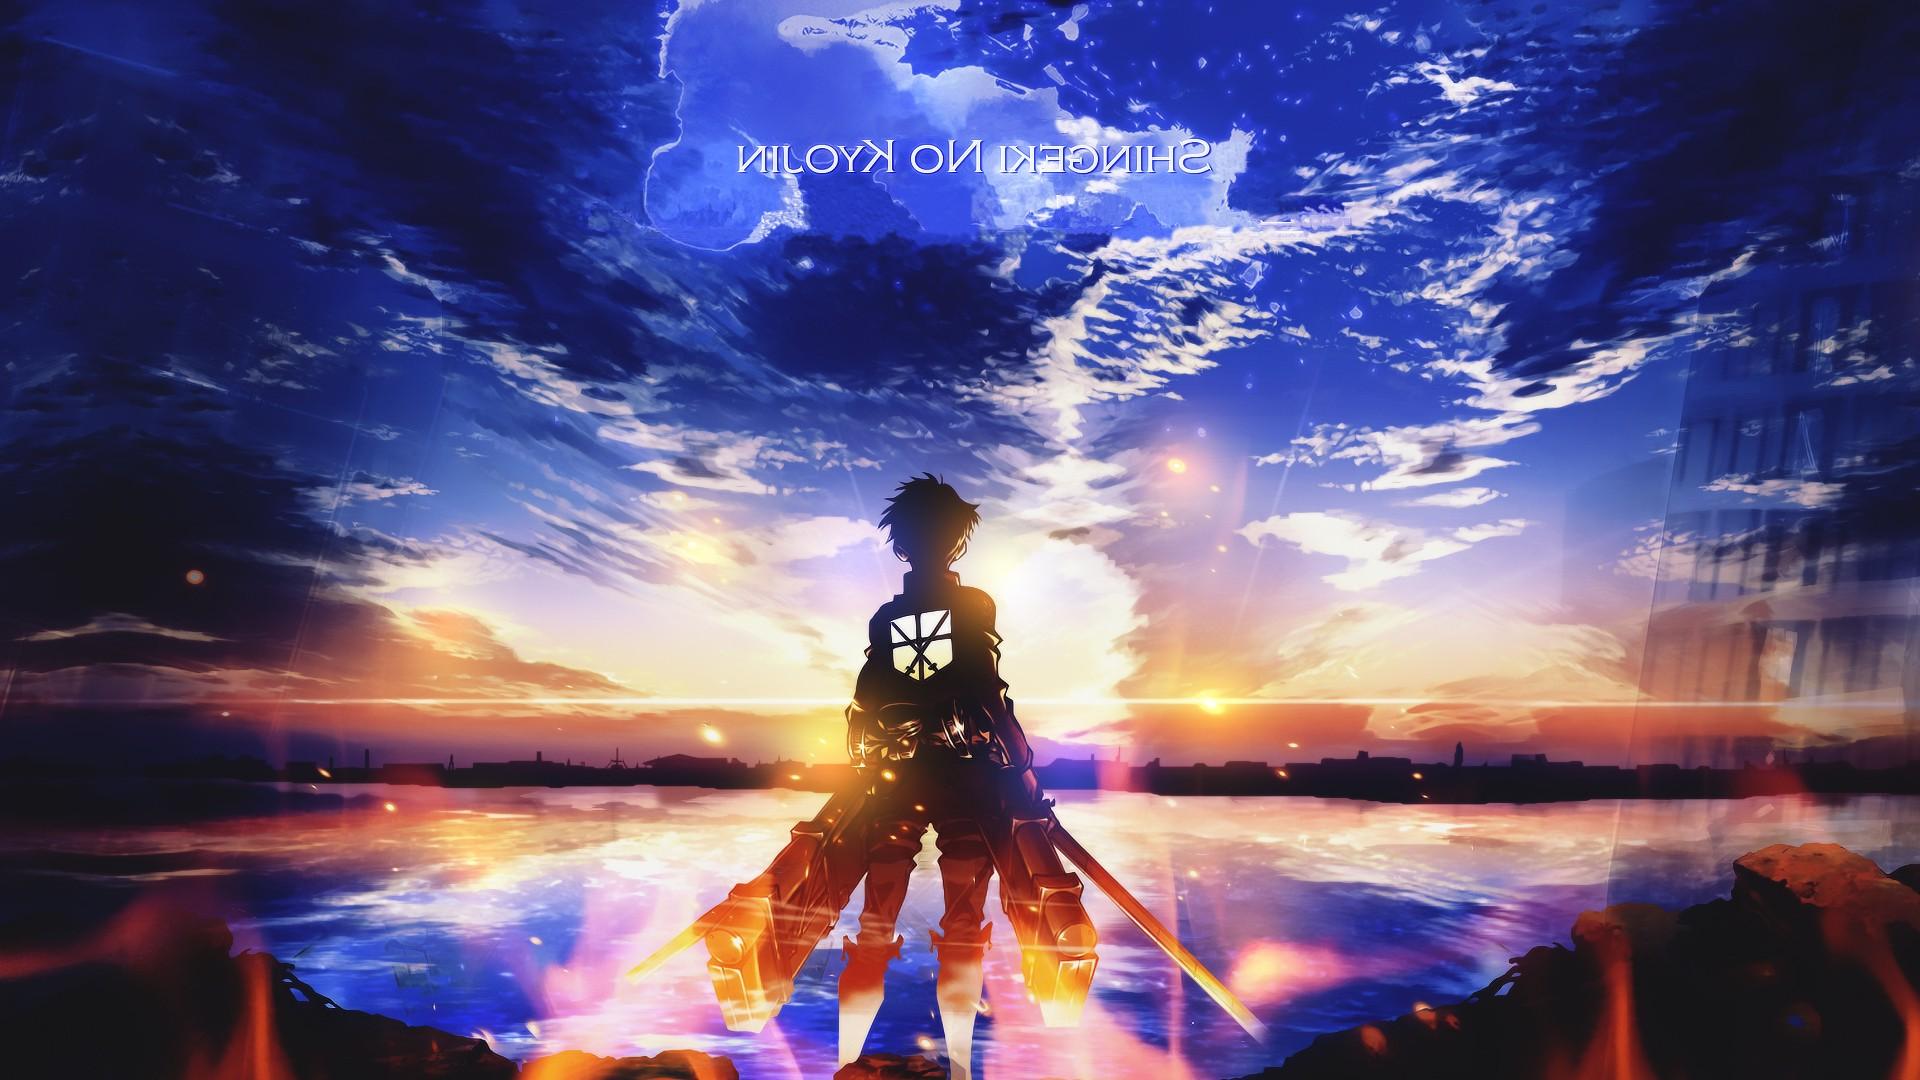 Wallpaper Sunset Anime Boys Water Nature Reflection Sky Evening Shingeki No Kyojin World Atmosphere Eren Jeager Light Fun Darkness 1920x1080 Px Computer Wallpaper Special Effects Phenomenon Theatrical Scenery 1920x1080 4kwallpaper